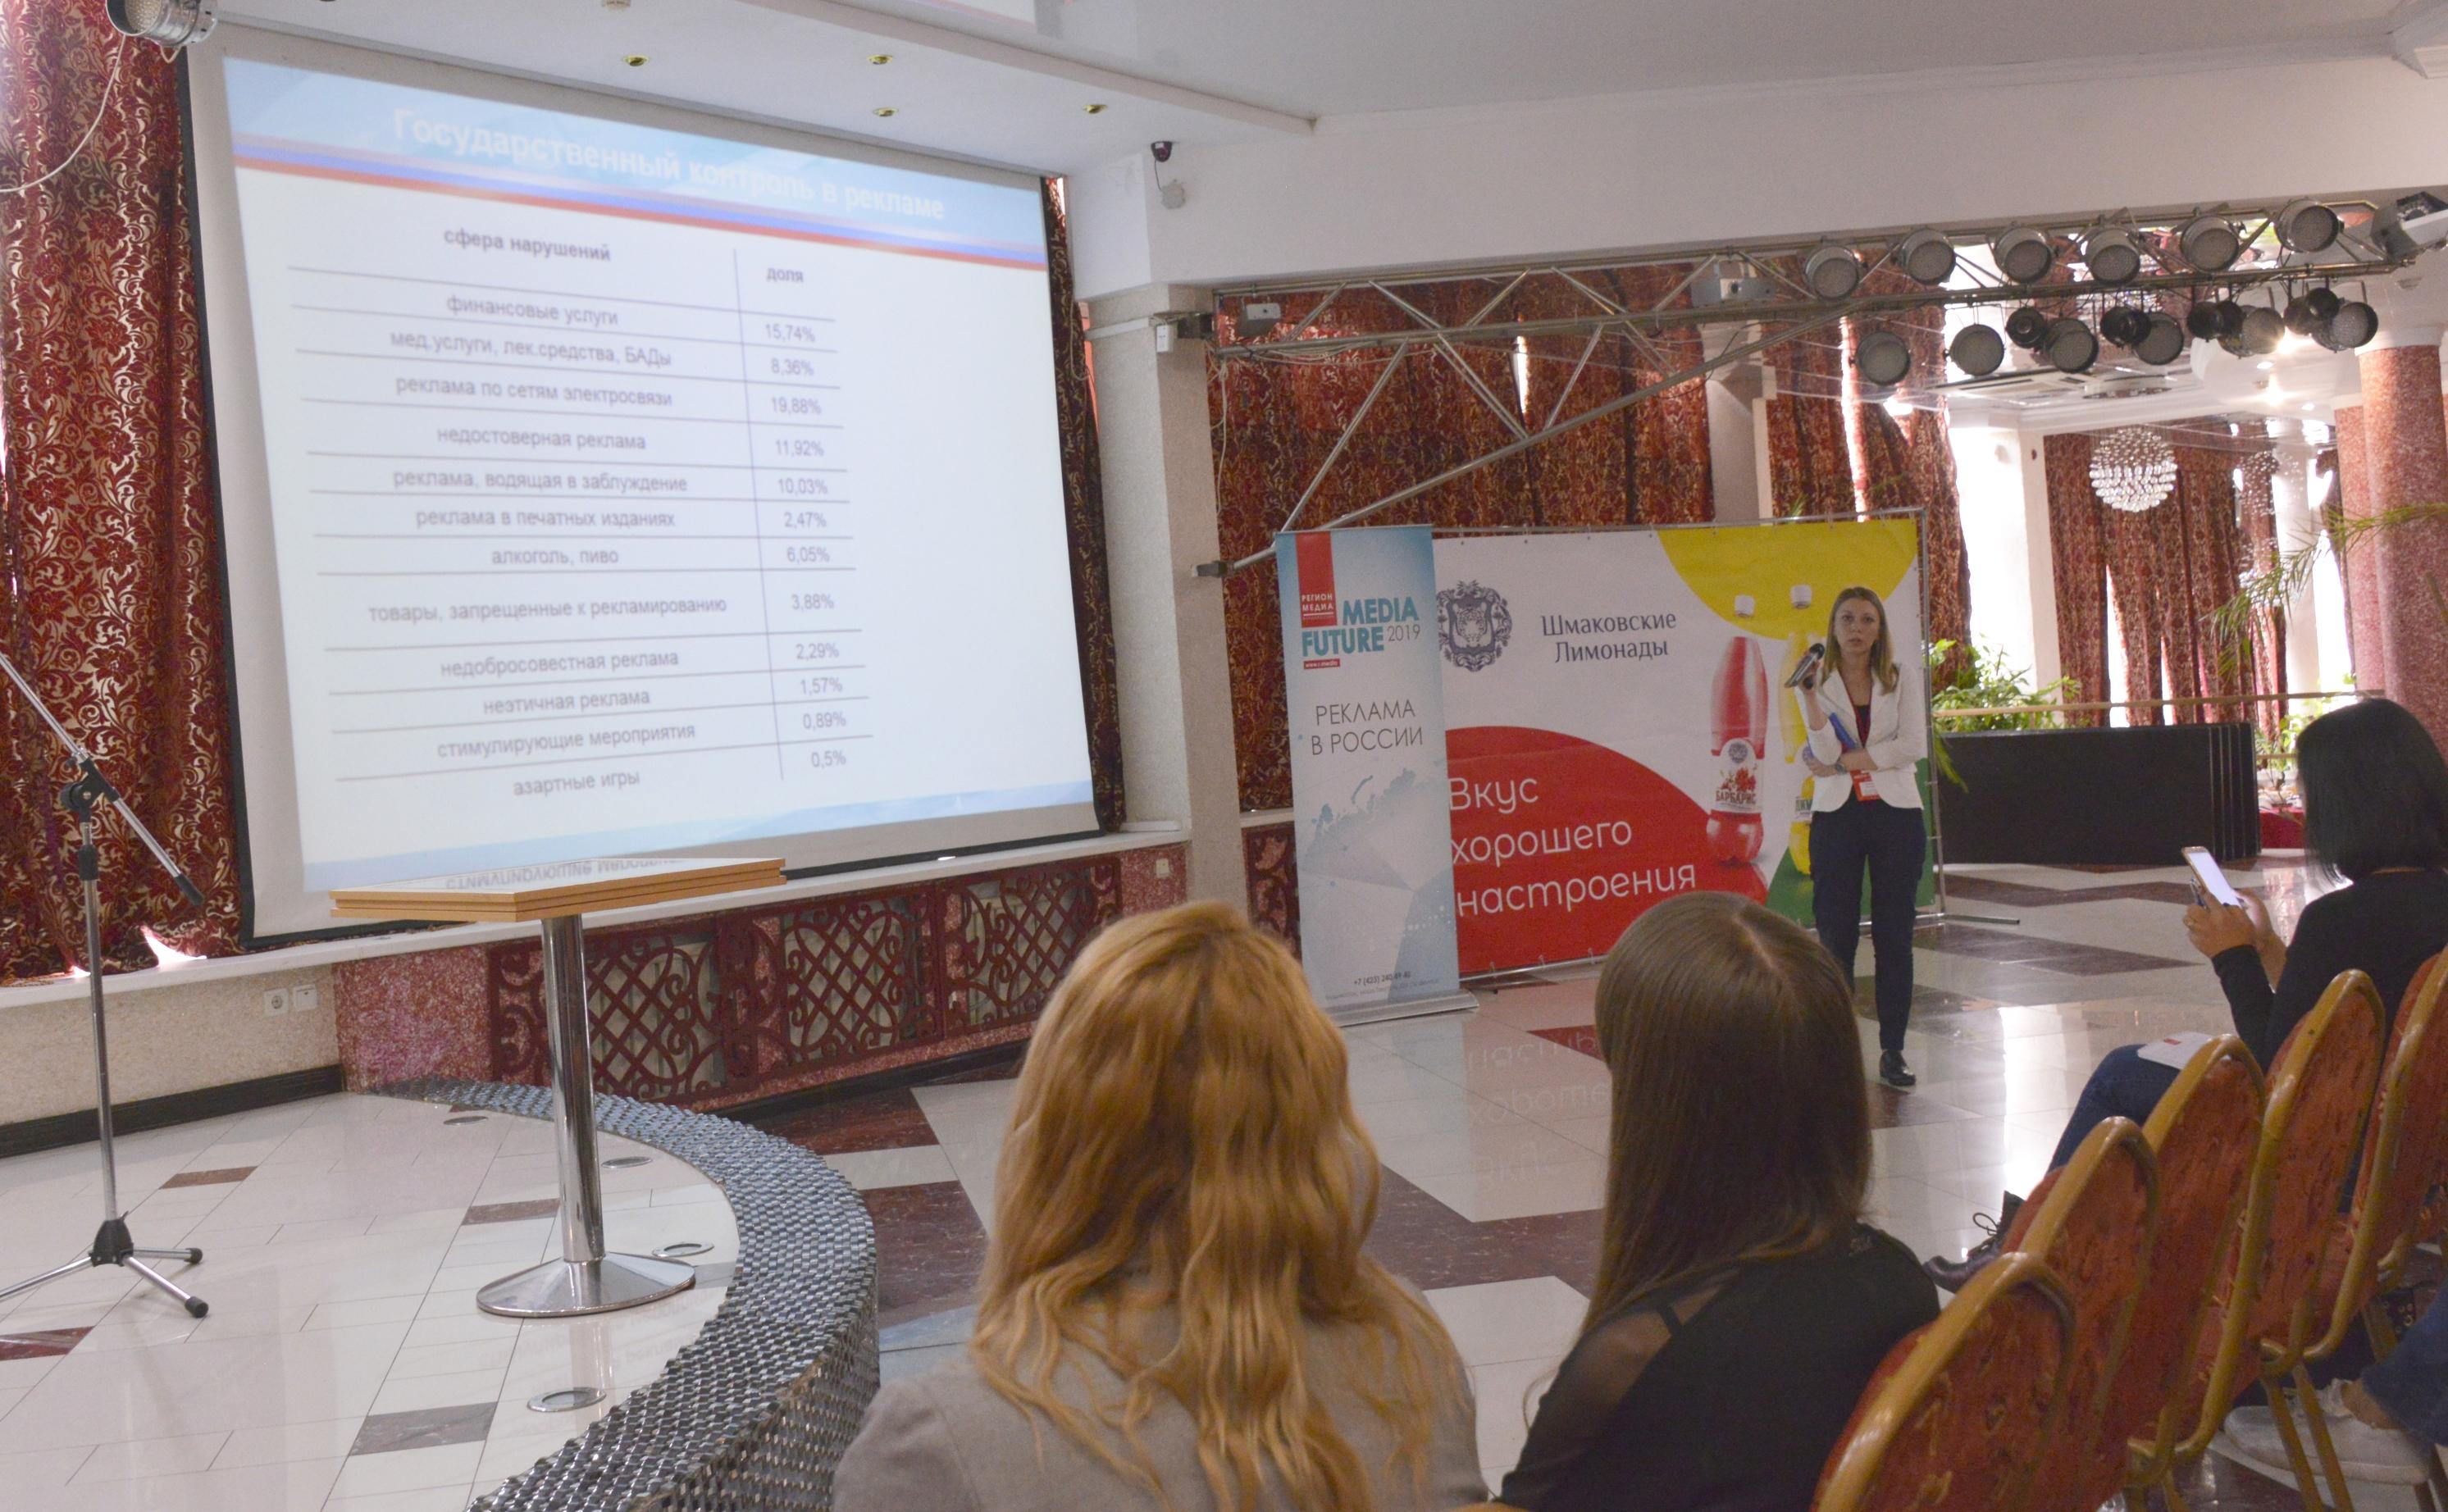 Шмаковская на конференции Media Future